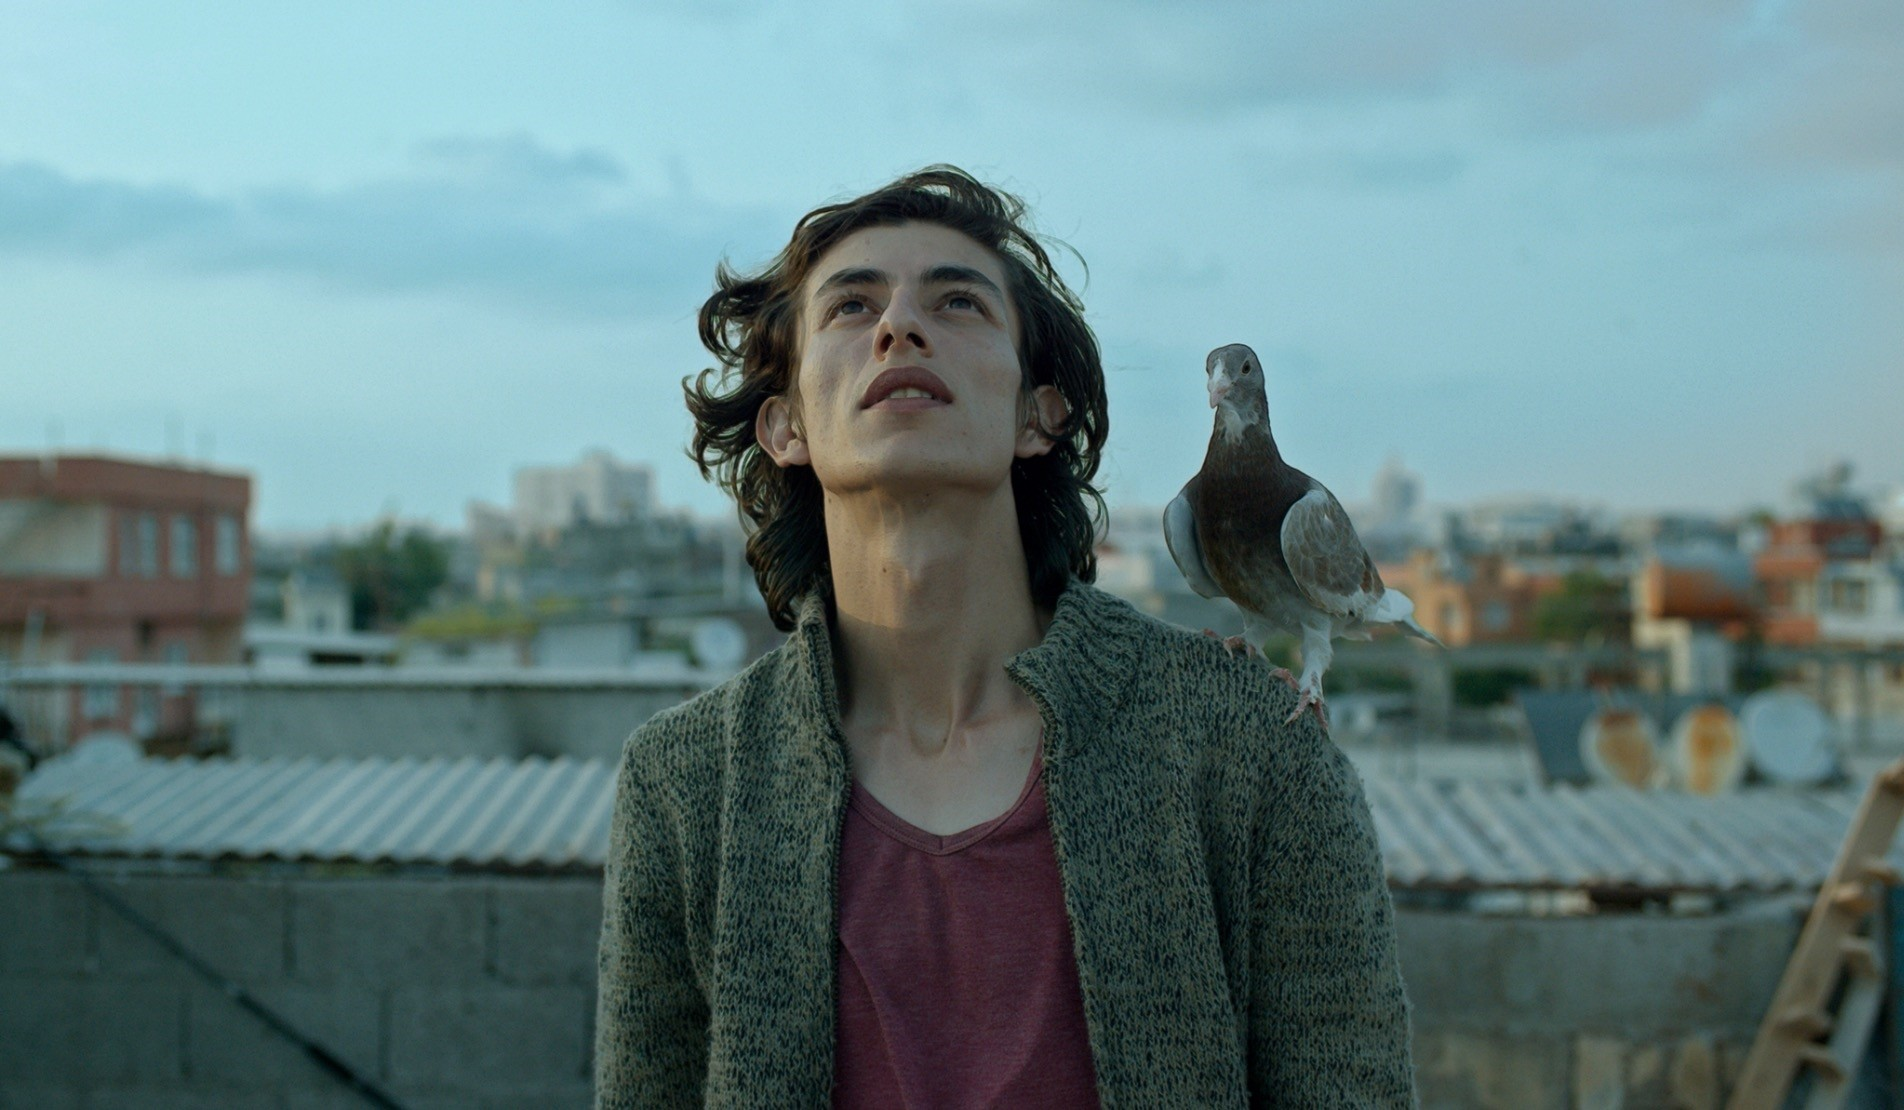 Banu Su0131vacu0131u2019s u201cGu00fcvercinu201d (The Pigeon) will be screened as part of the festivalu2019s Turkish Films section.